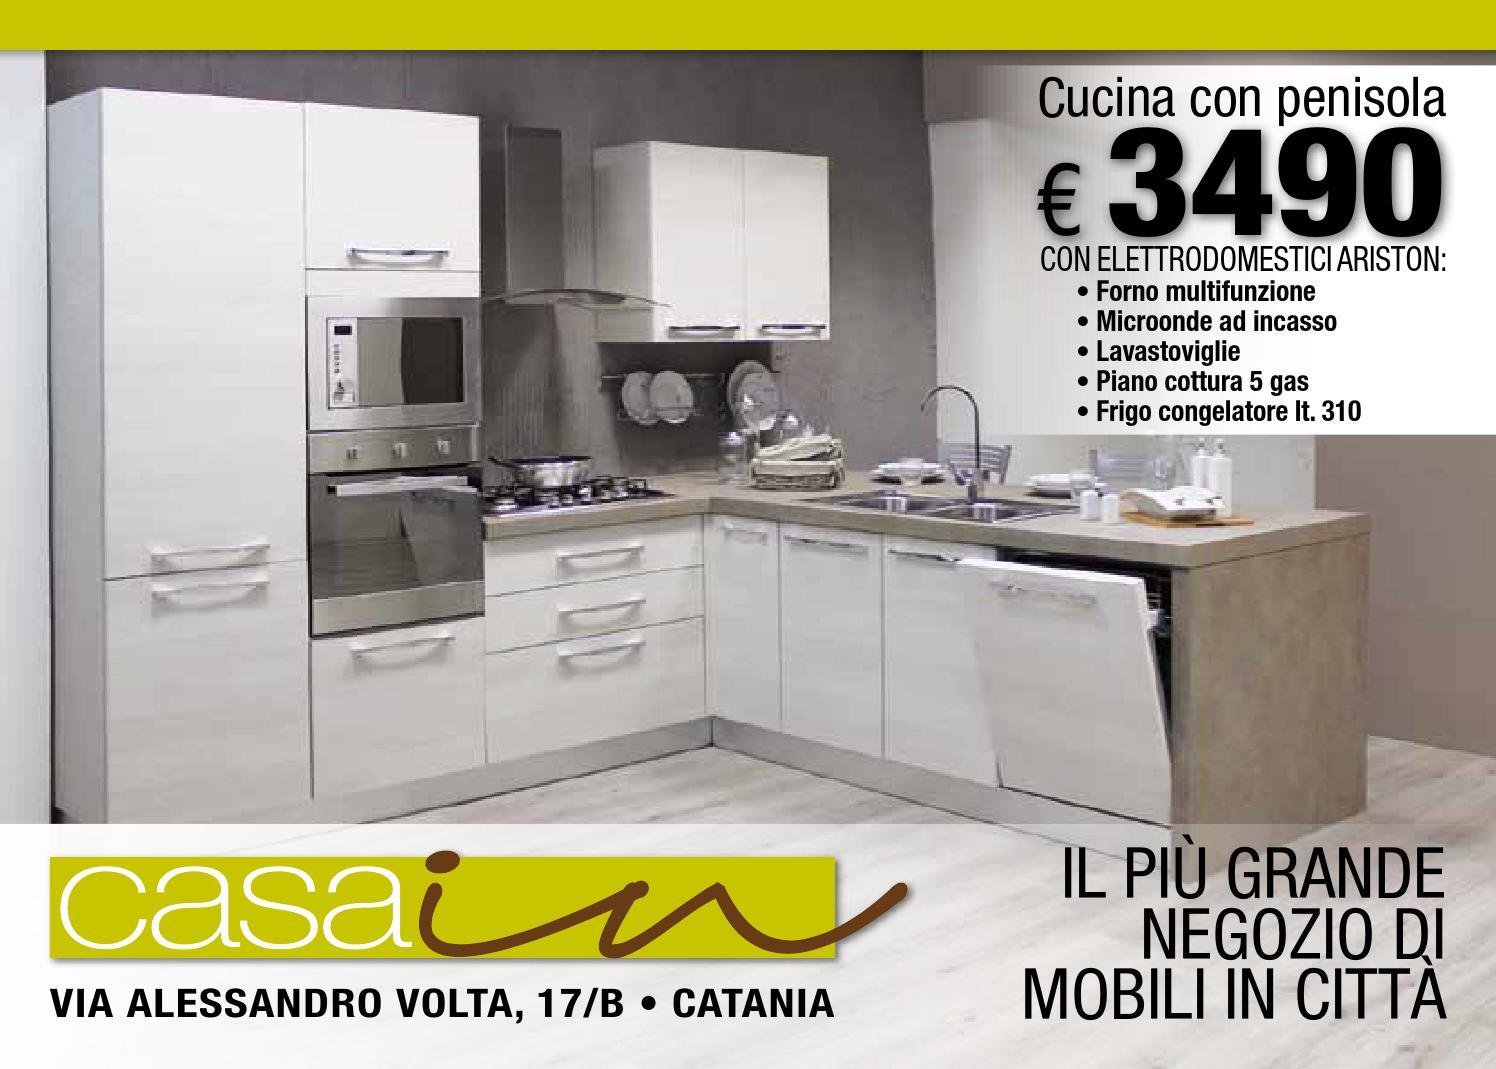 Volantino agosto 2013 casain by plaja mercato issuu for Plaja mercato arredi